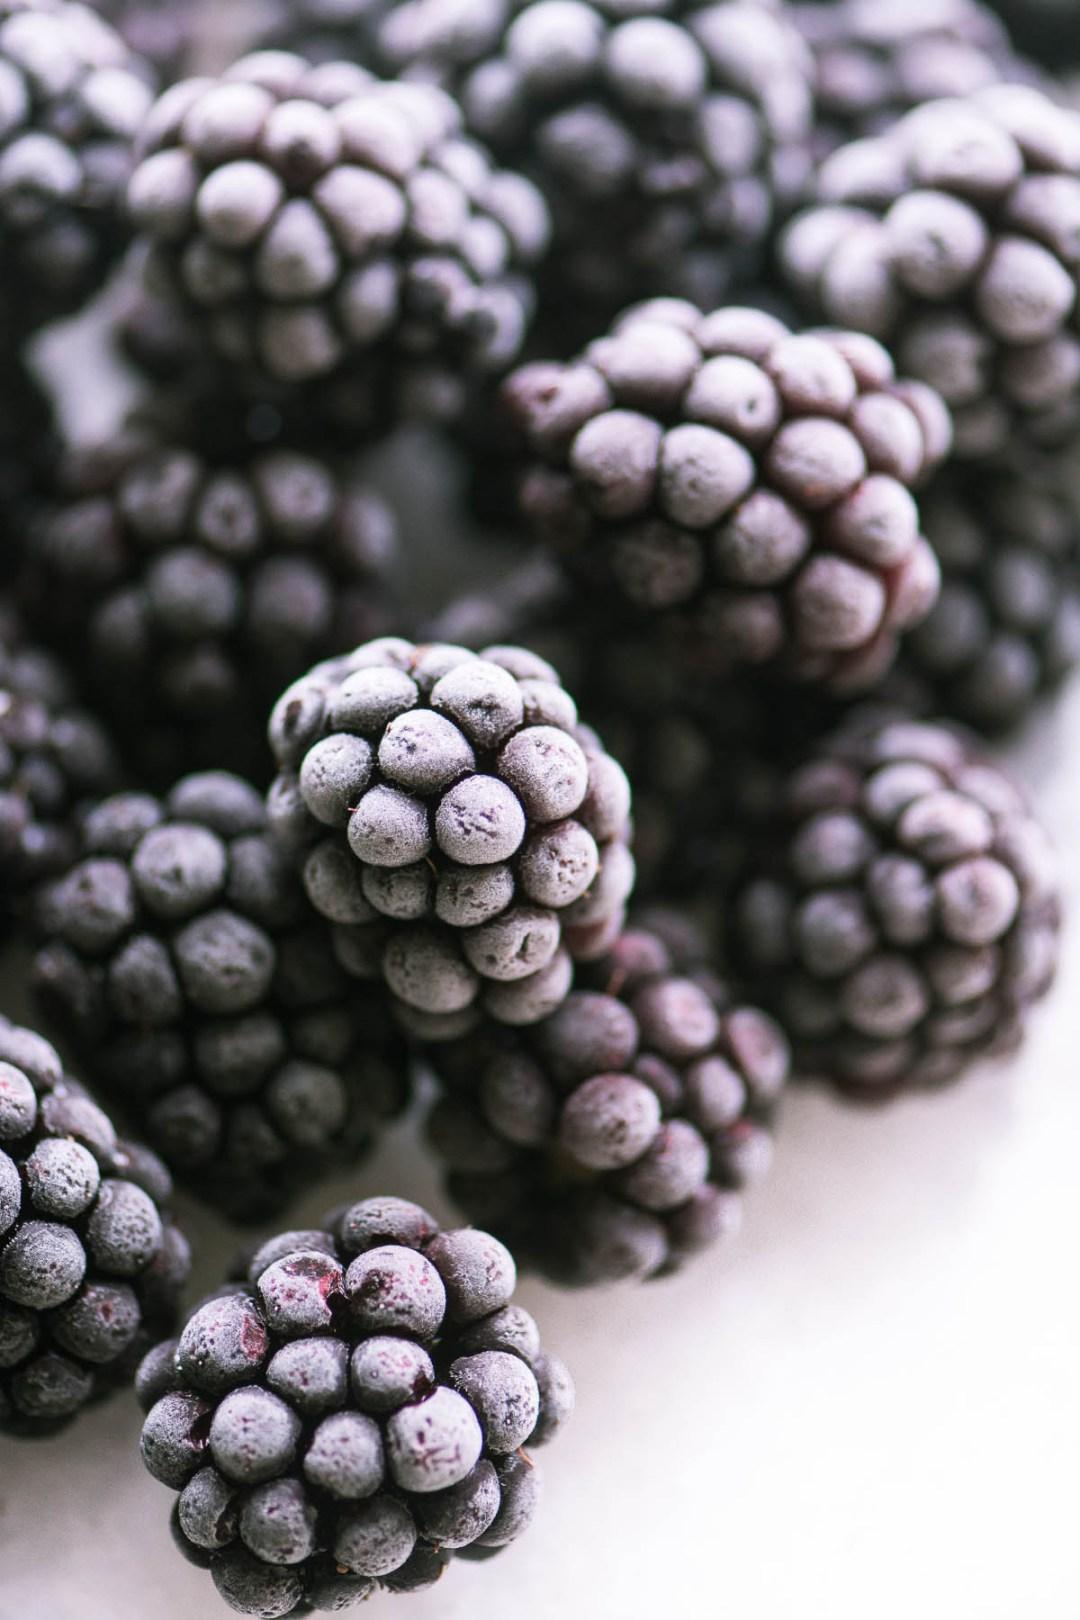 Frozen blackberries for a frozen blackberry moscato slushie